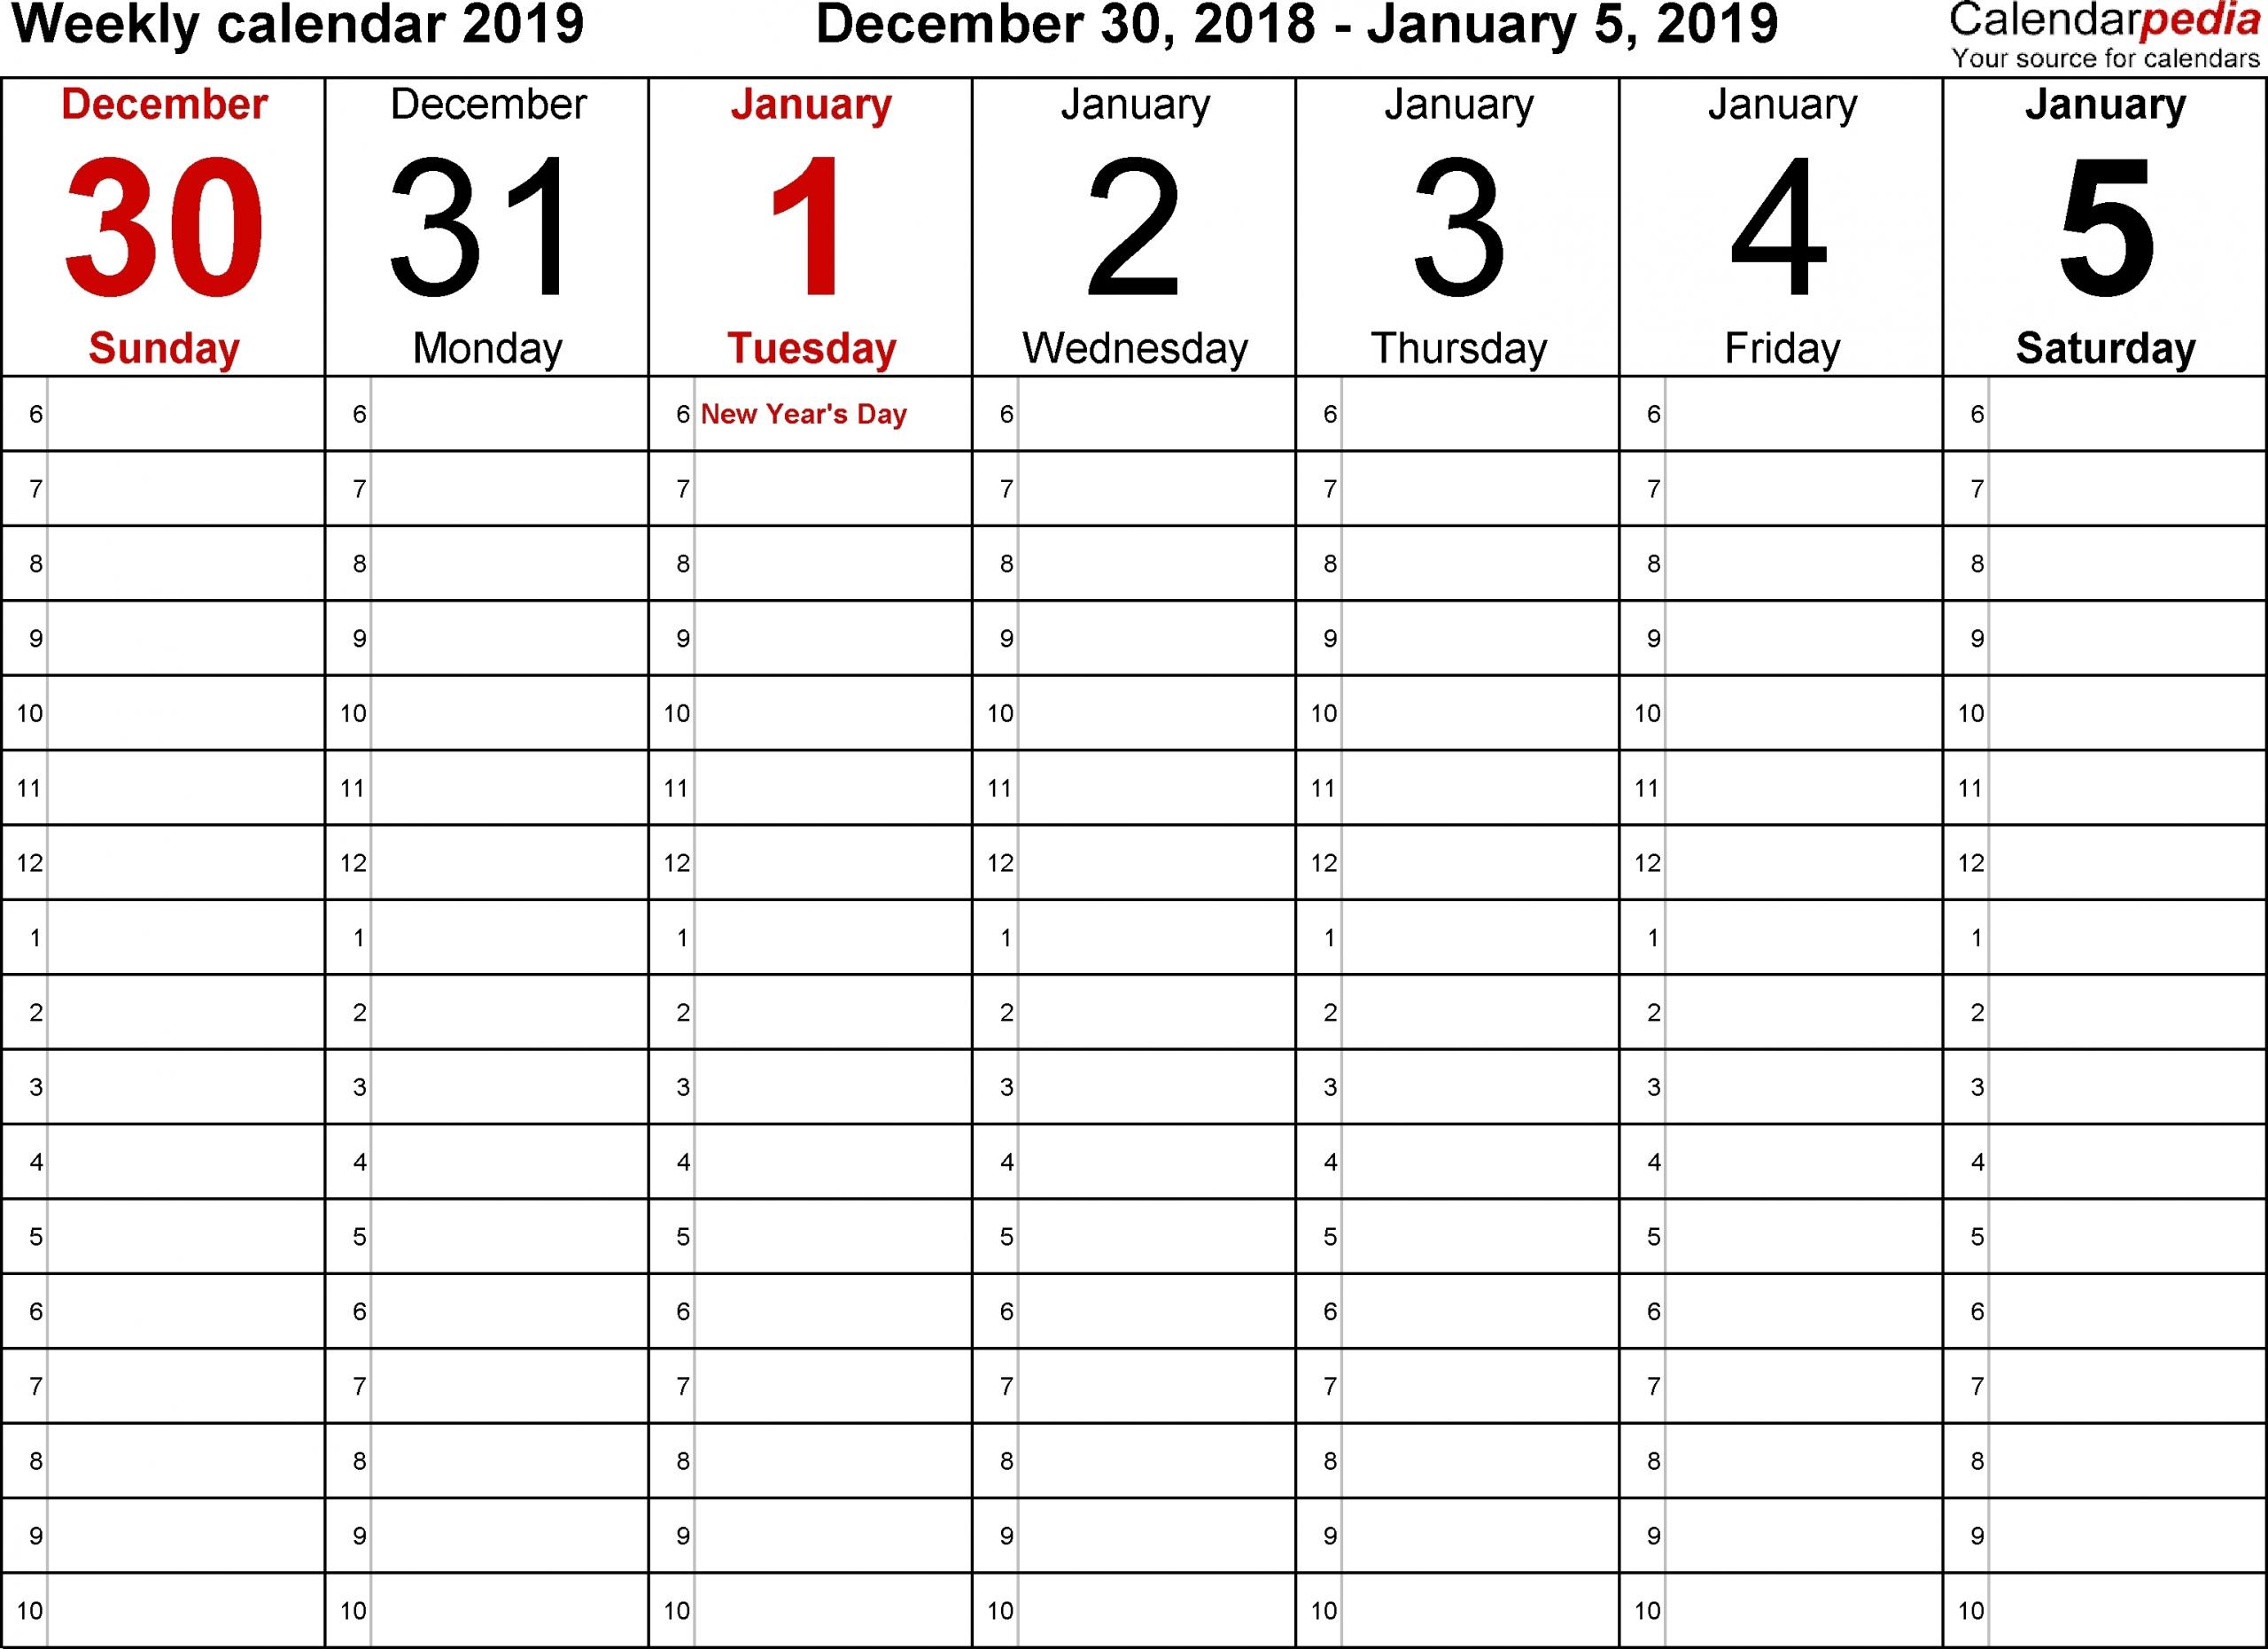 5 Day Week Blank Calendar With Time Slots Printable - Calendar Inspiration Design